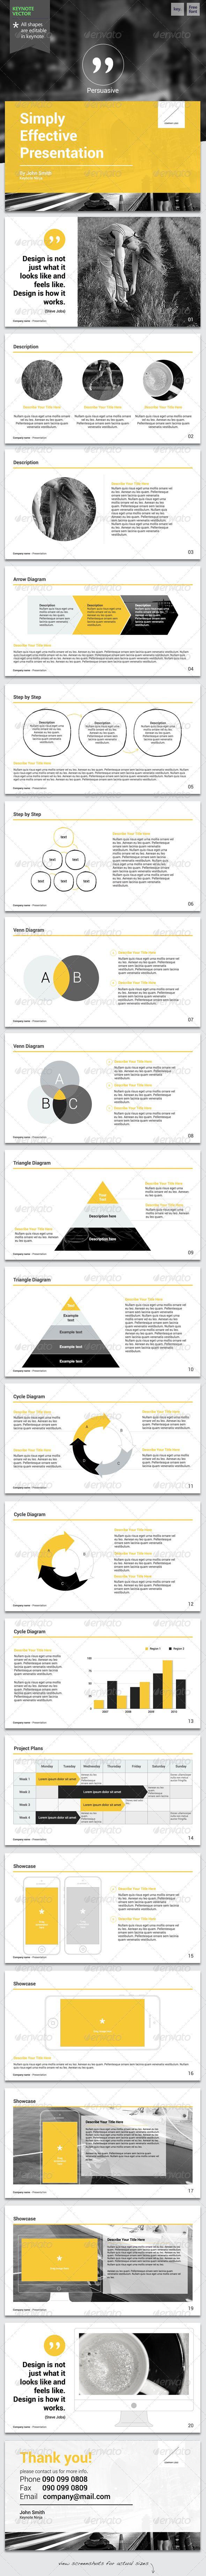 Persuasive - Keynote Presentation | Keynote theme / template